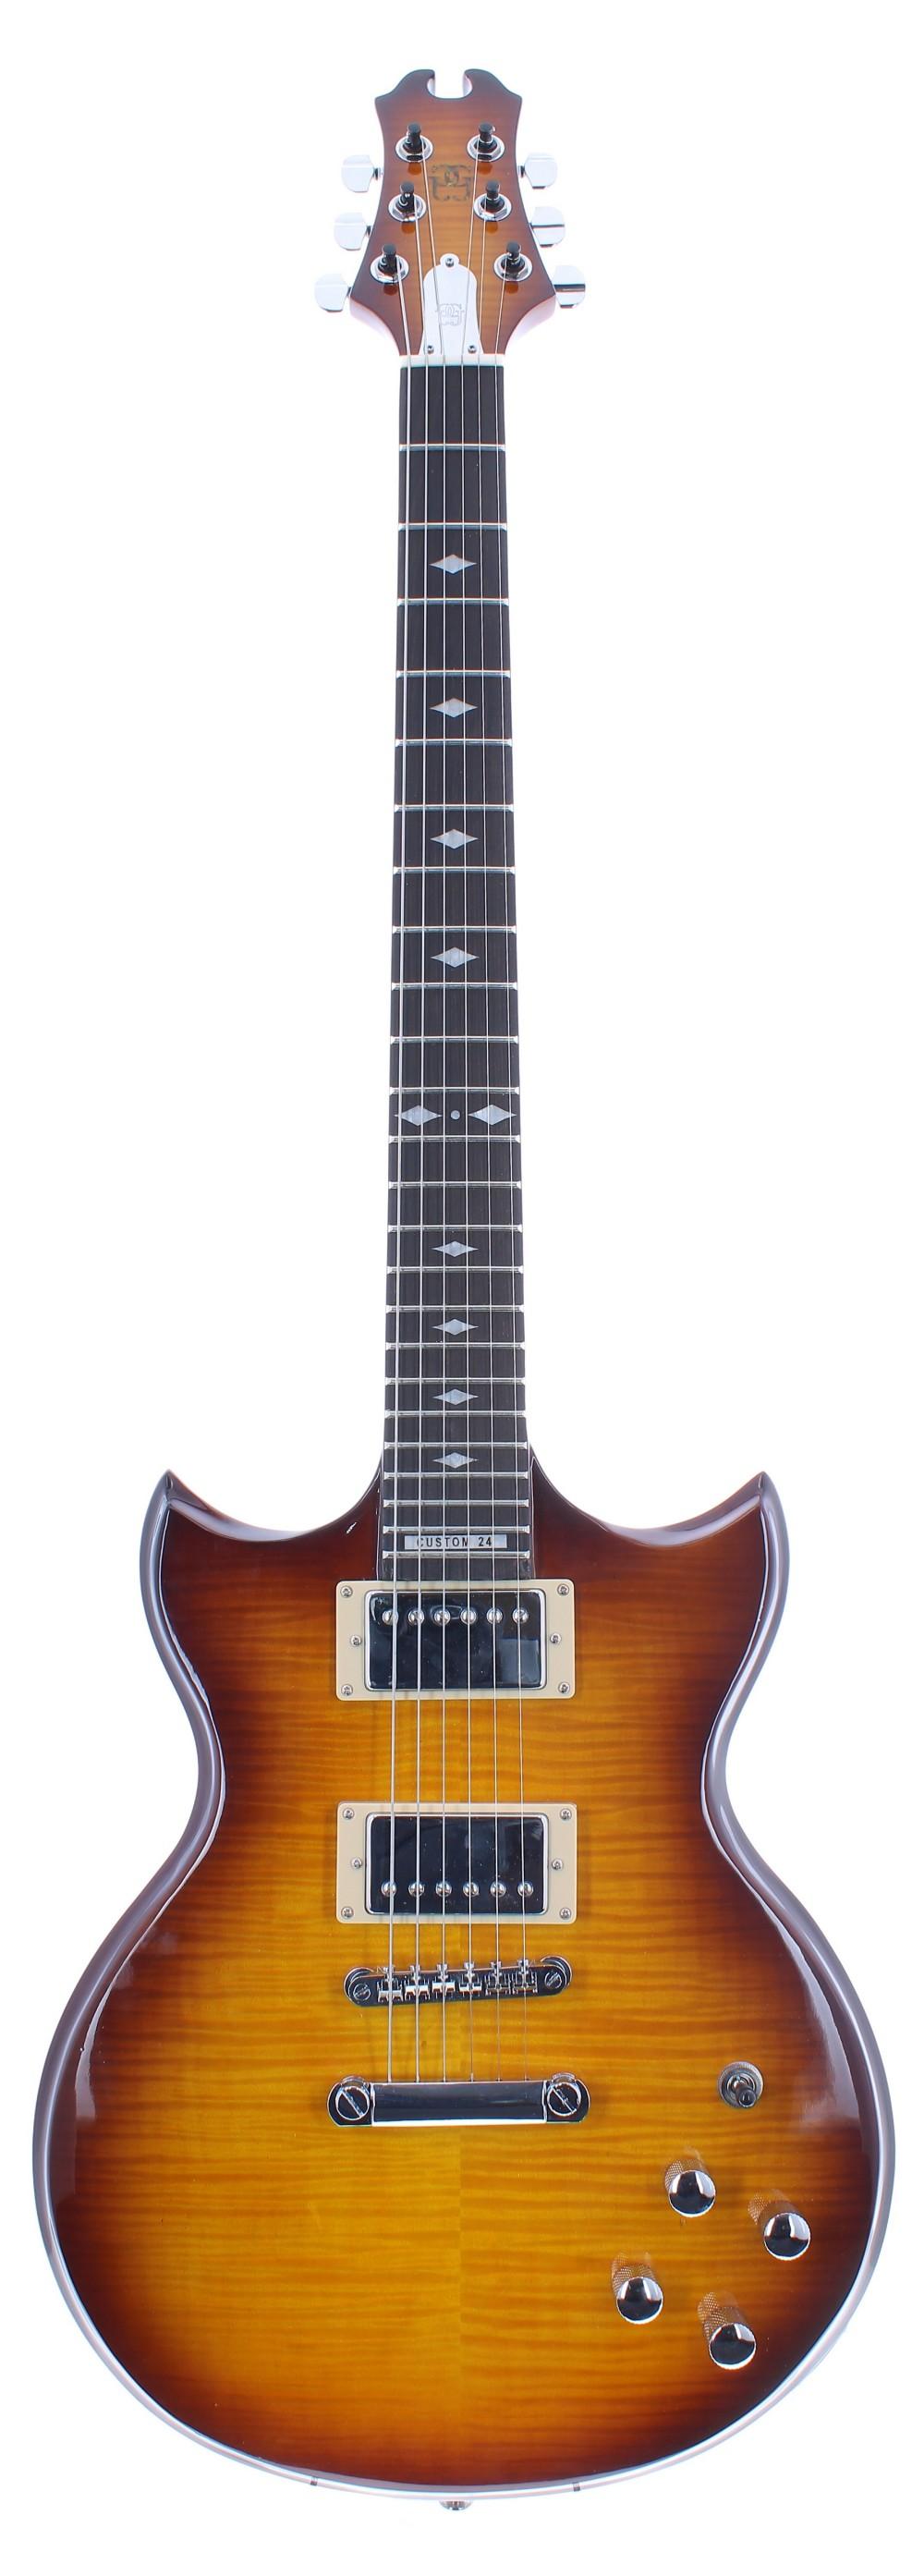 Kenn Gordon Custom 24 SG electric guitar, ser. no. ATxxxx1; Finish: honey burst; Fretboard: ebony;